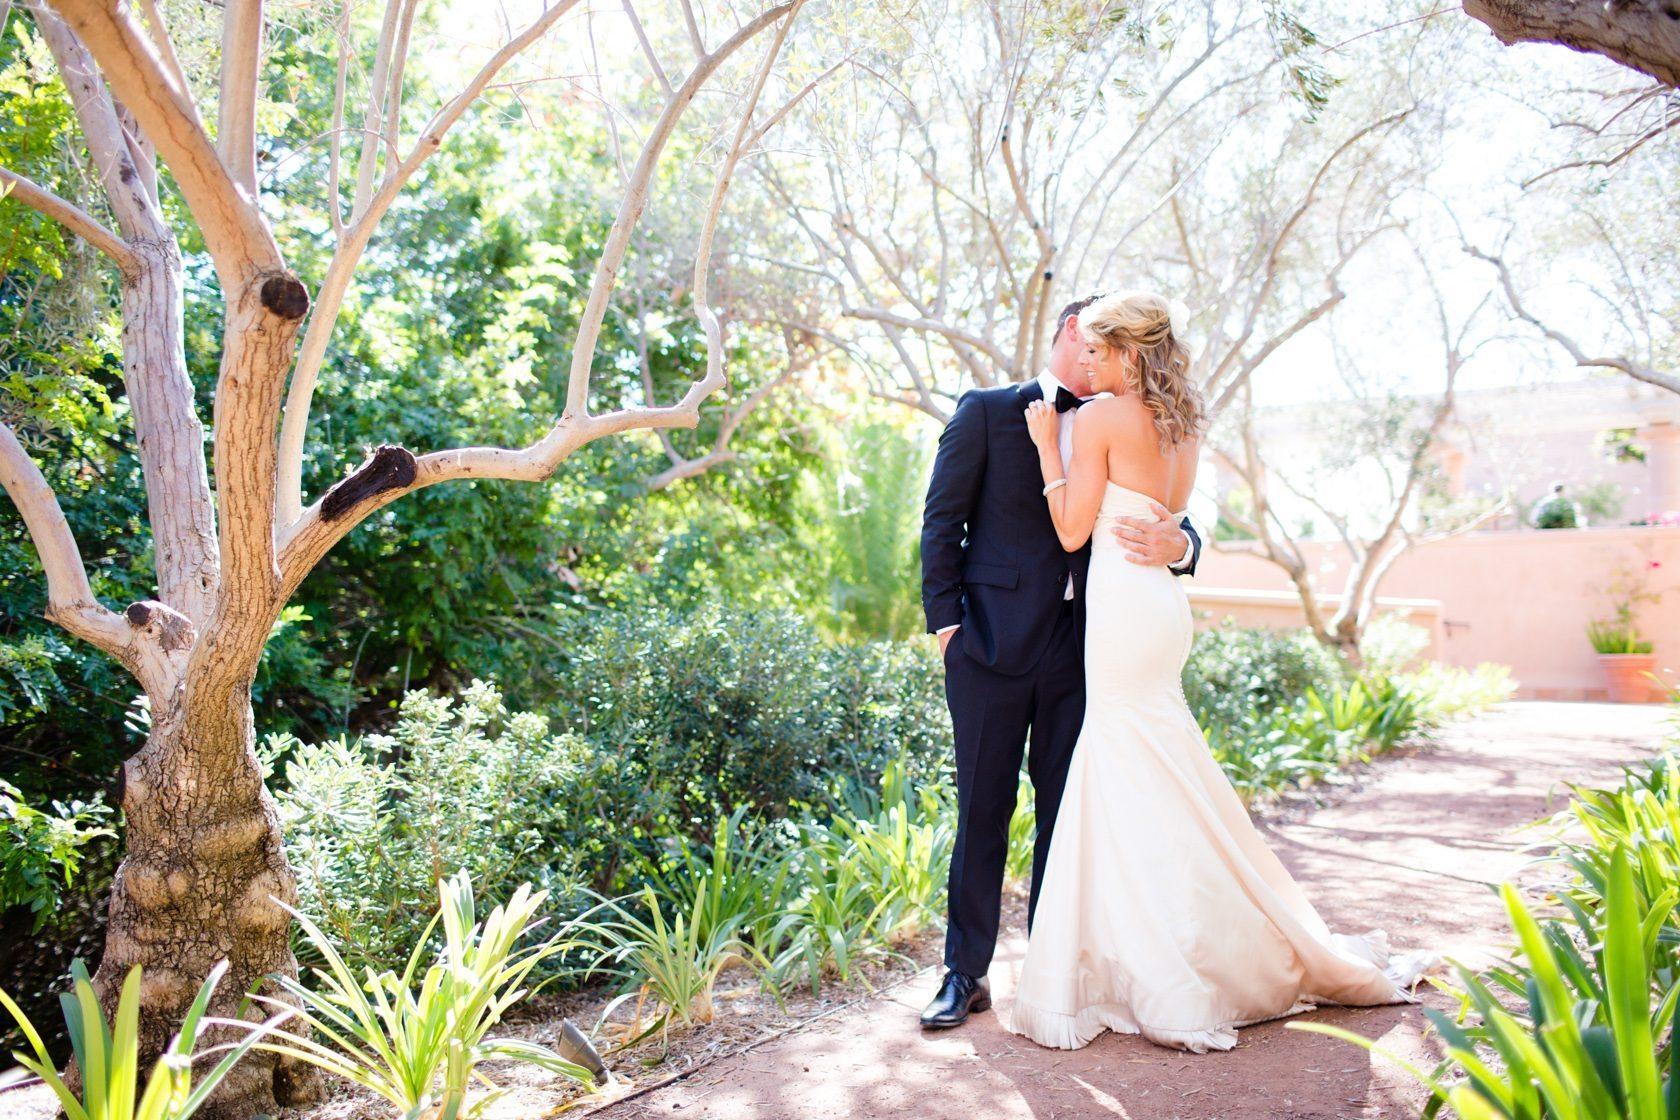 Rancho_Valencia_Resort_Wedding_028-1680x1120.jpg